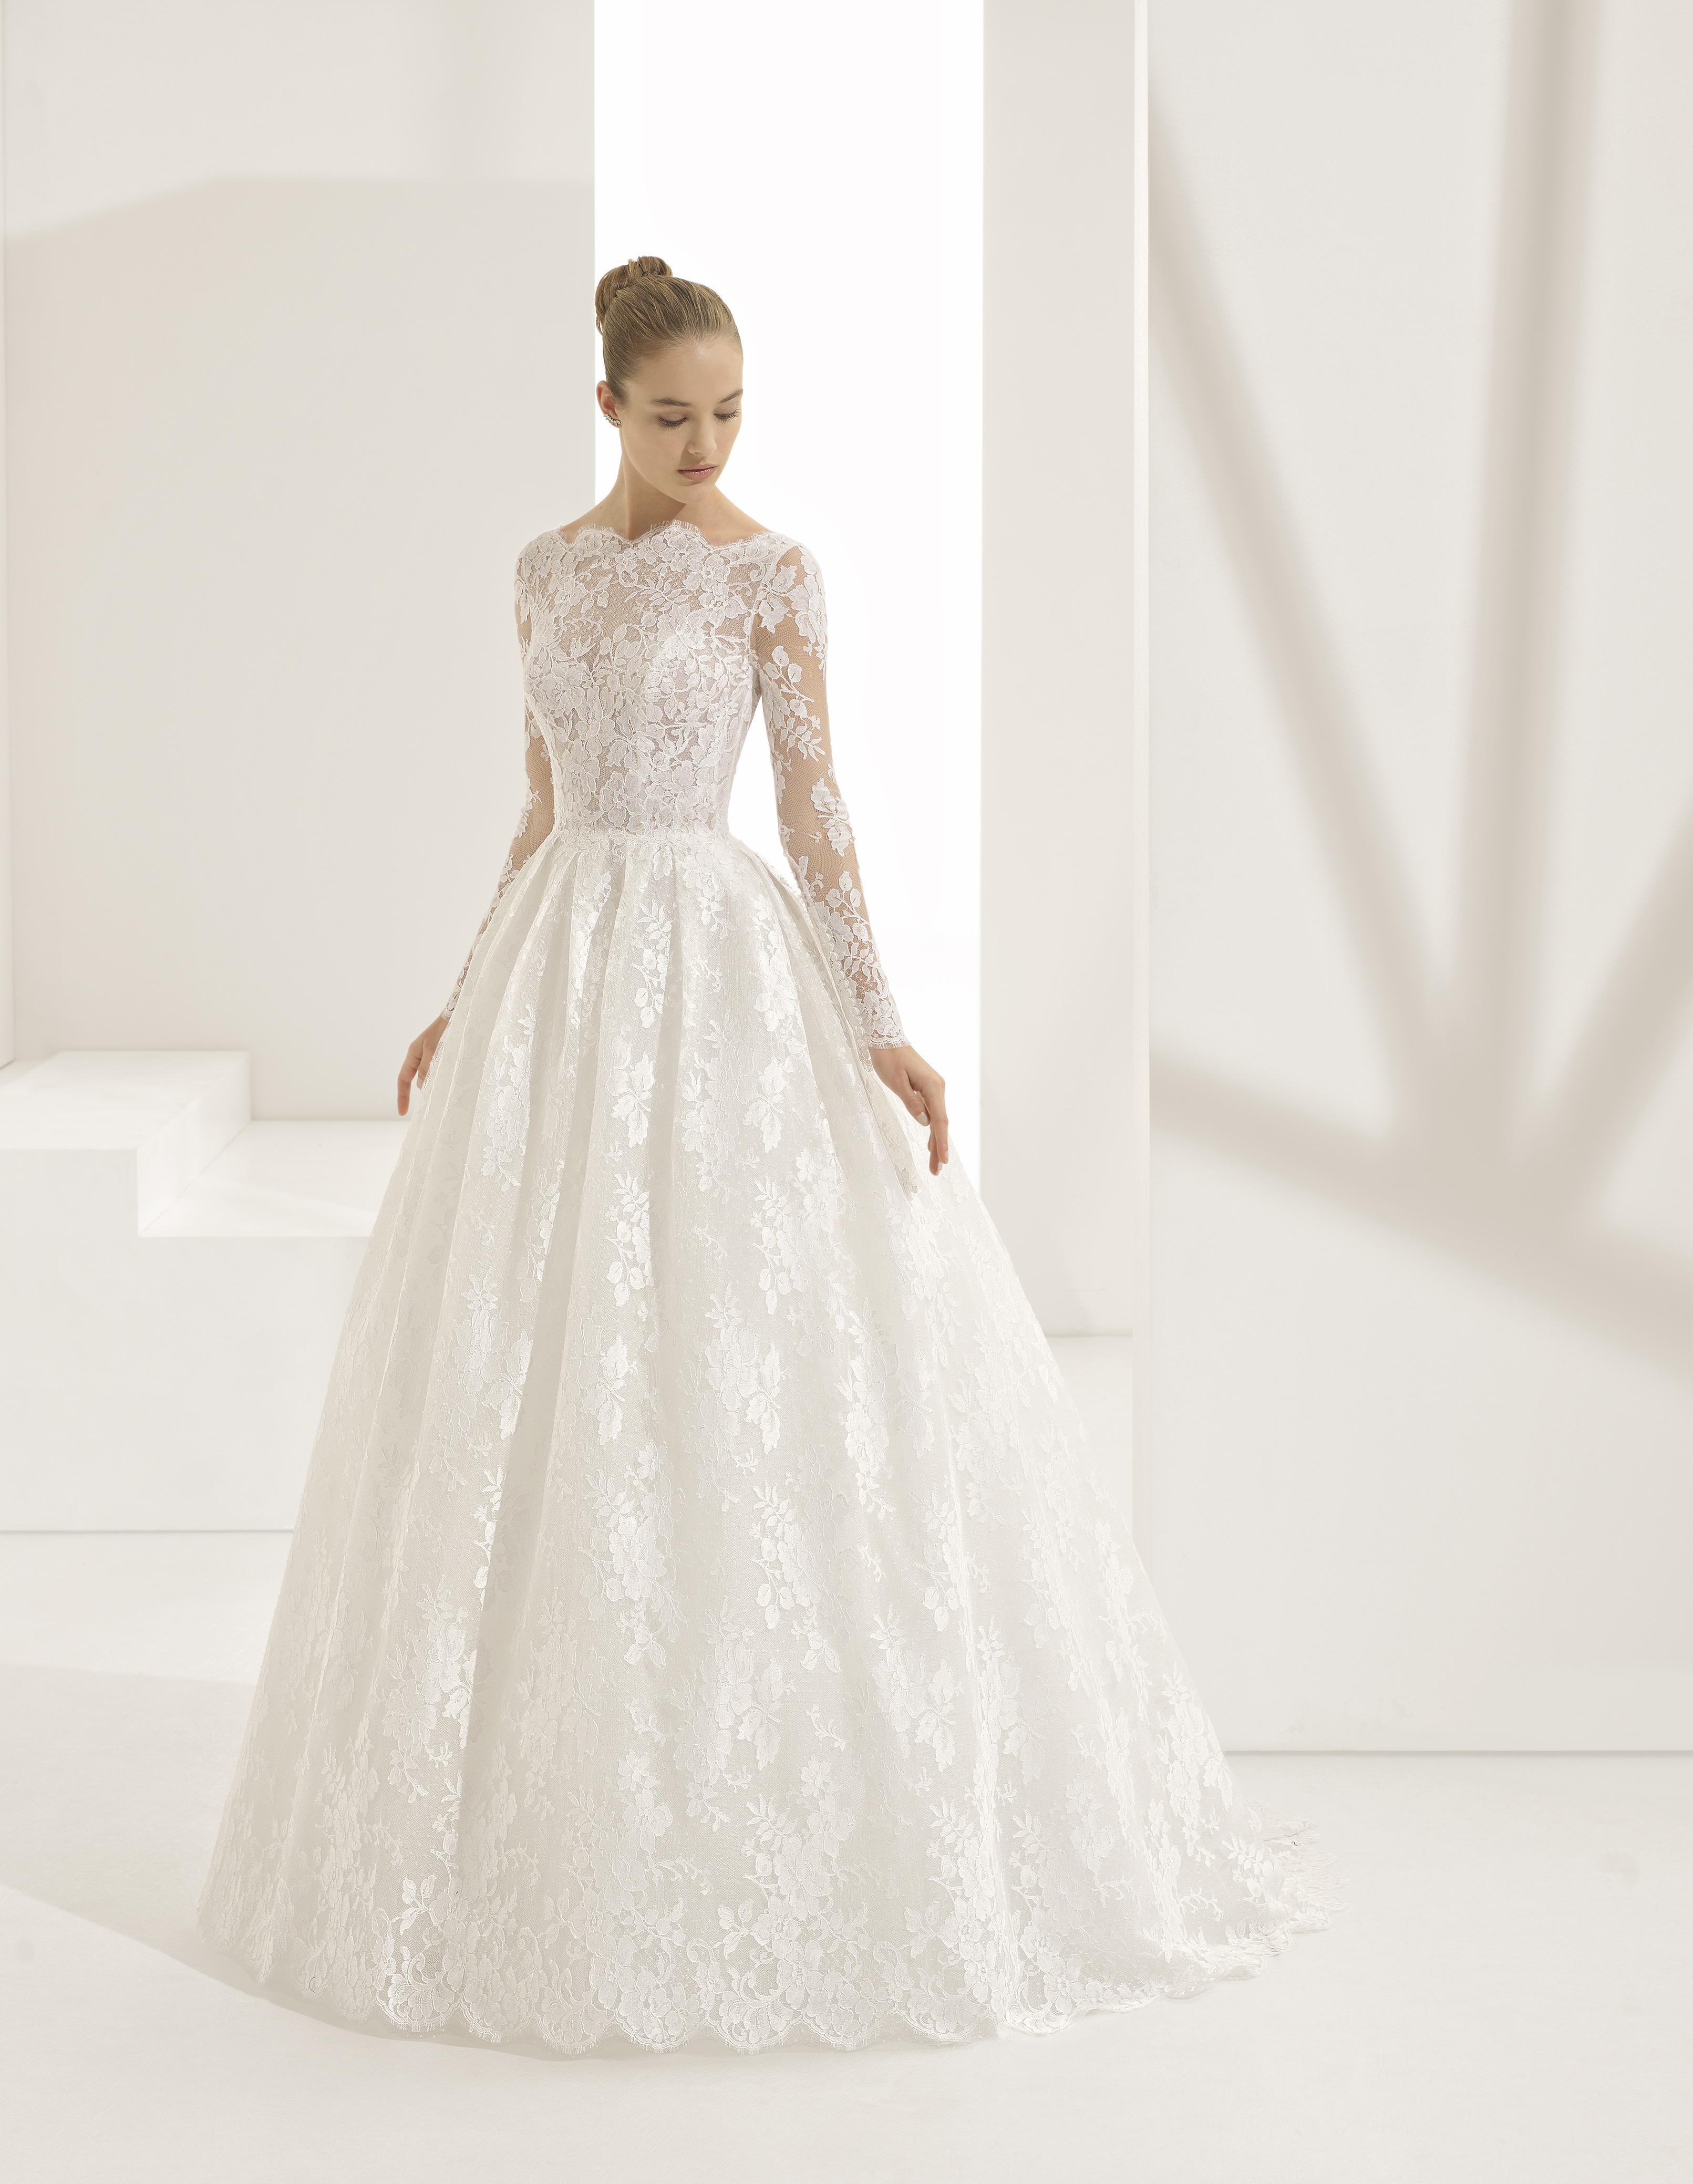 Mira Couture Rosa Clara Pastora Wedding Gown Bridal Dress Chicago Boutique Front